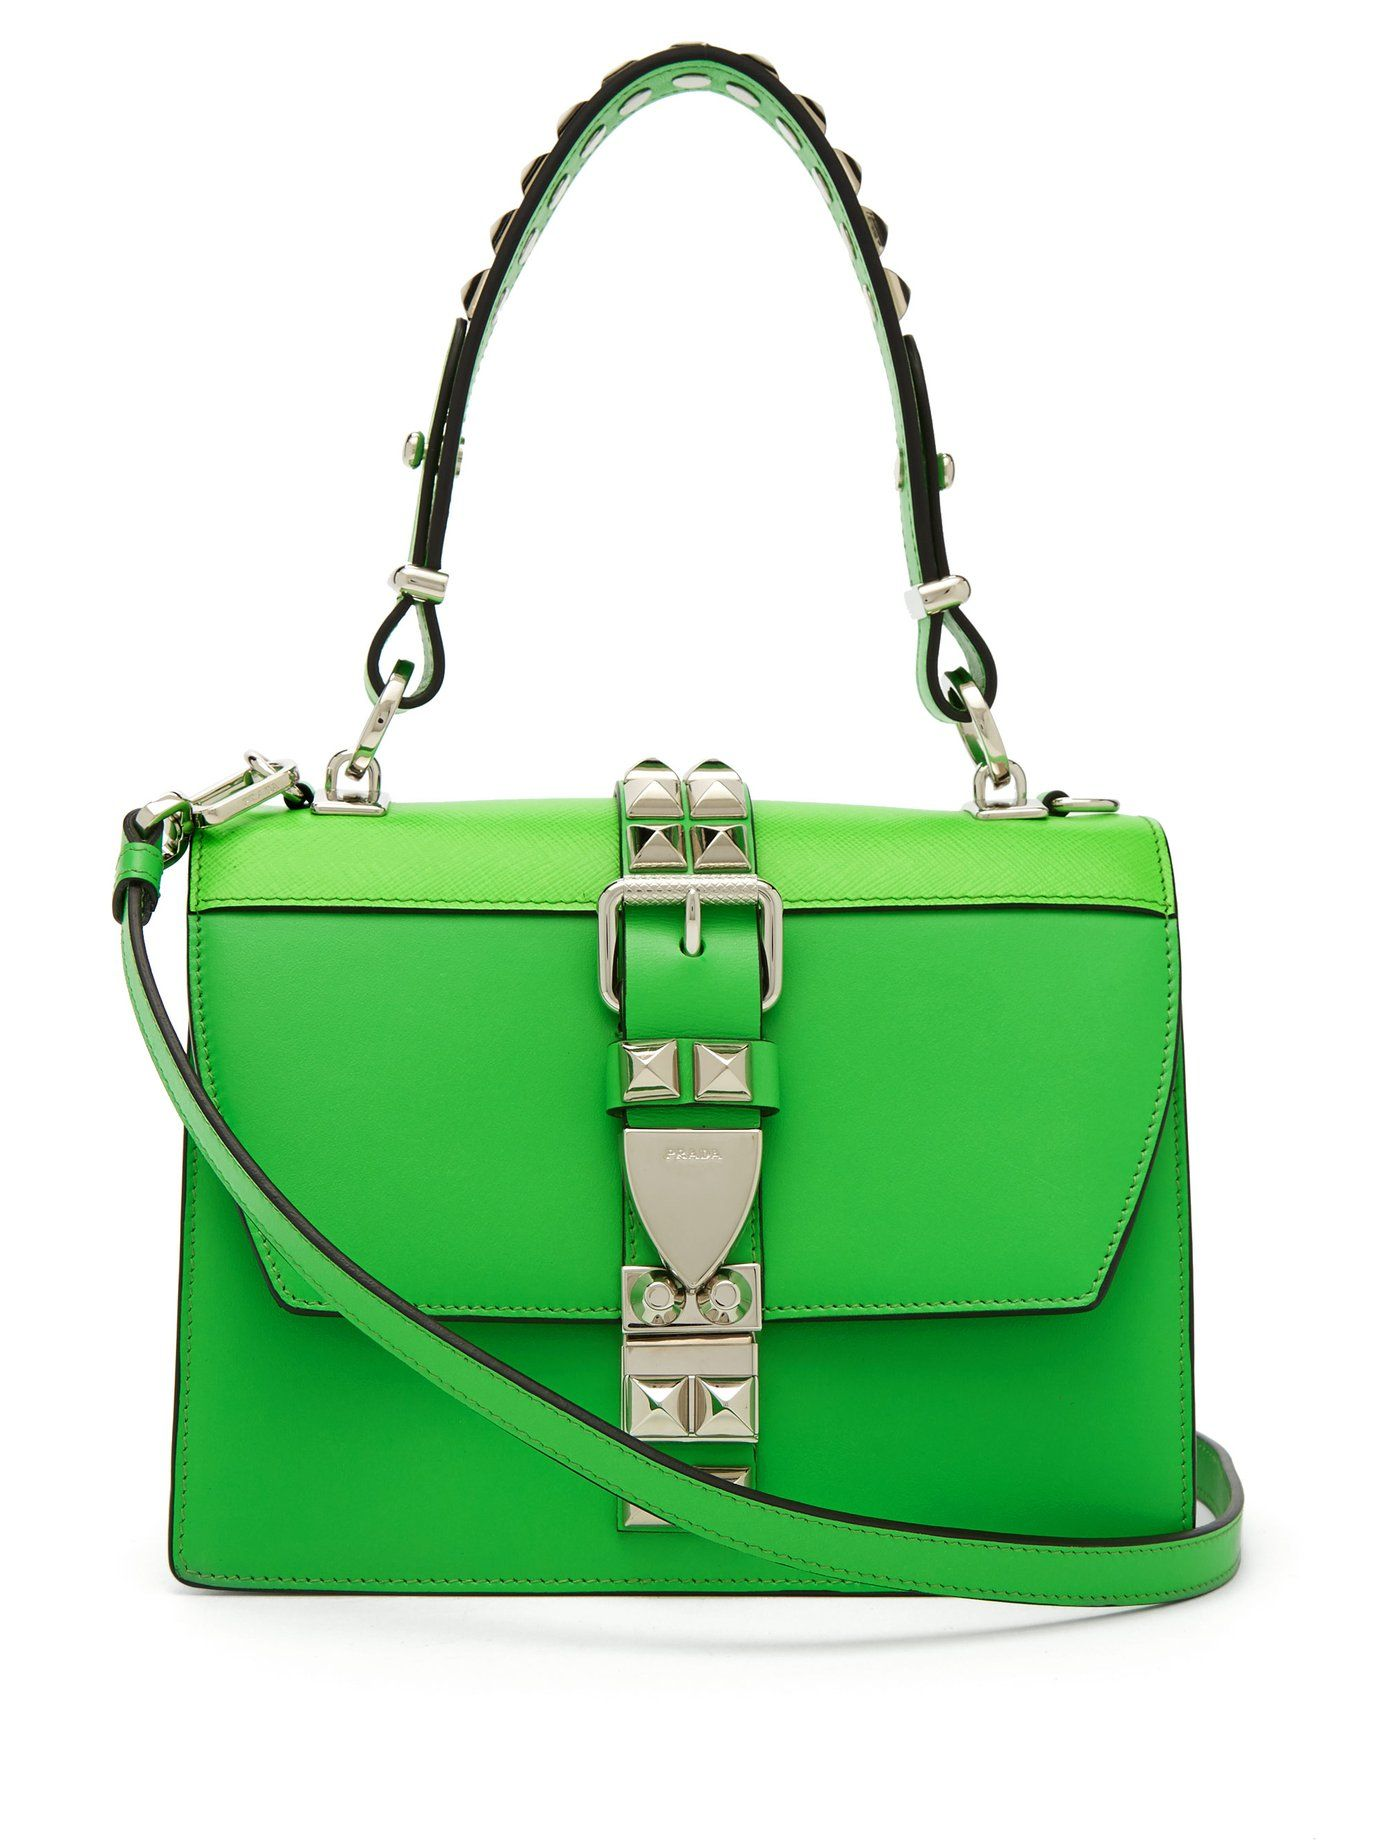 e037d6dbe32f PRADA Elektra leather shoulder bag £1